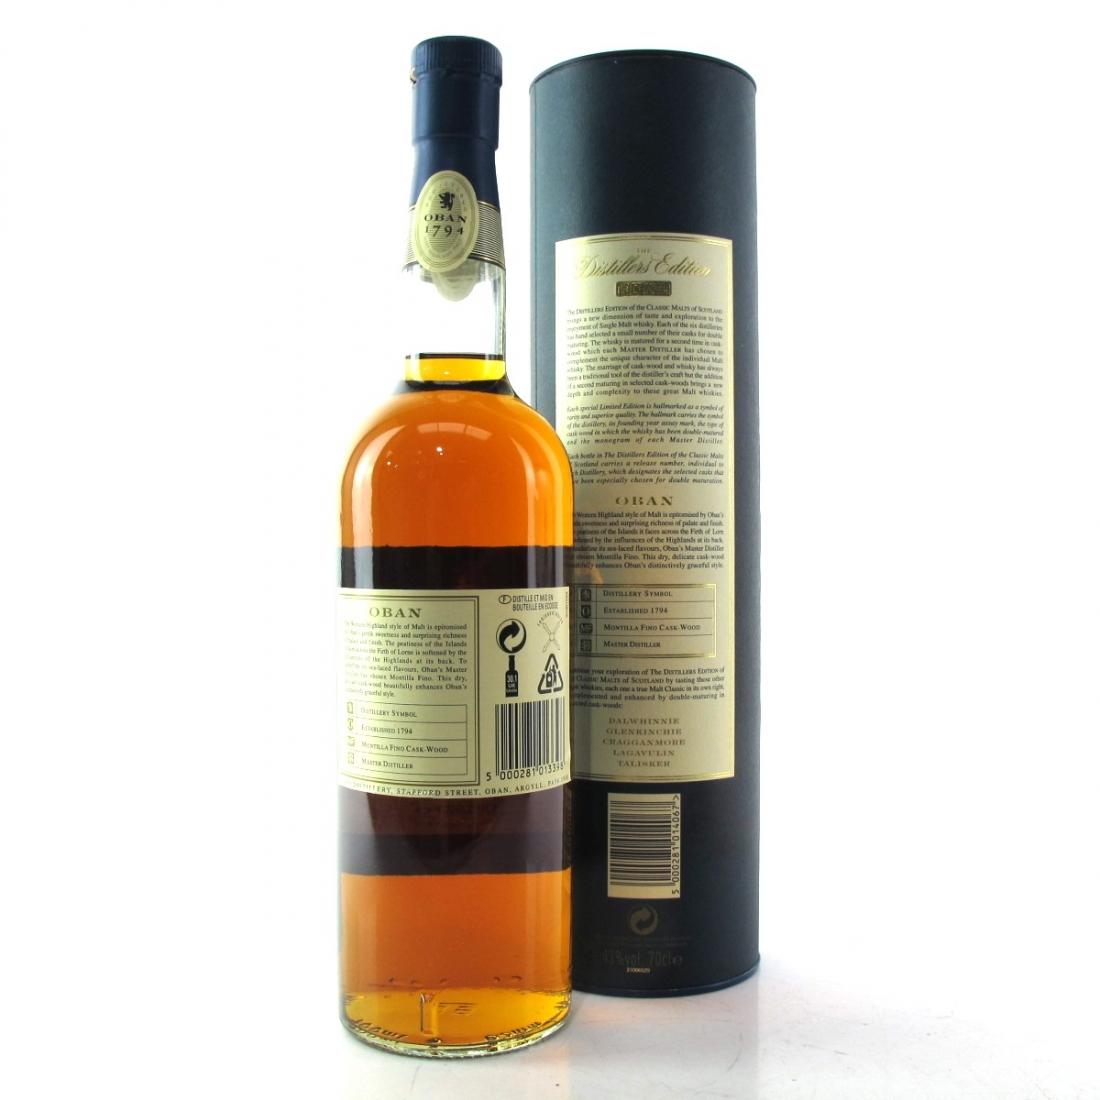 Oban 1989 Distillers Edition